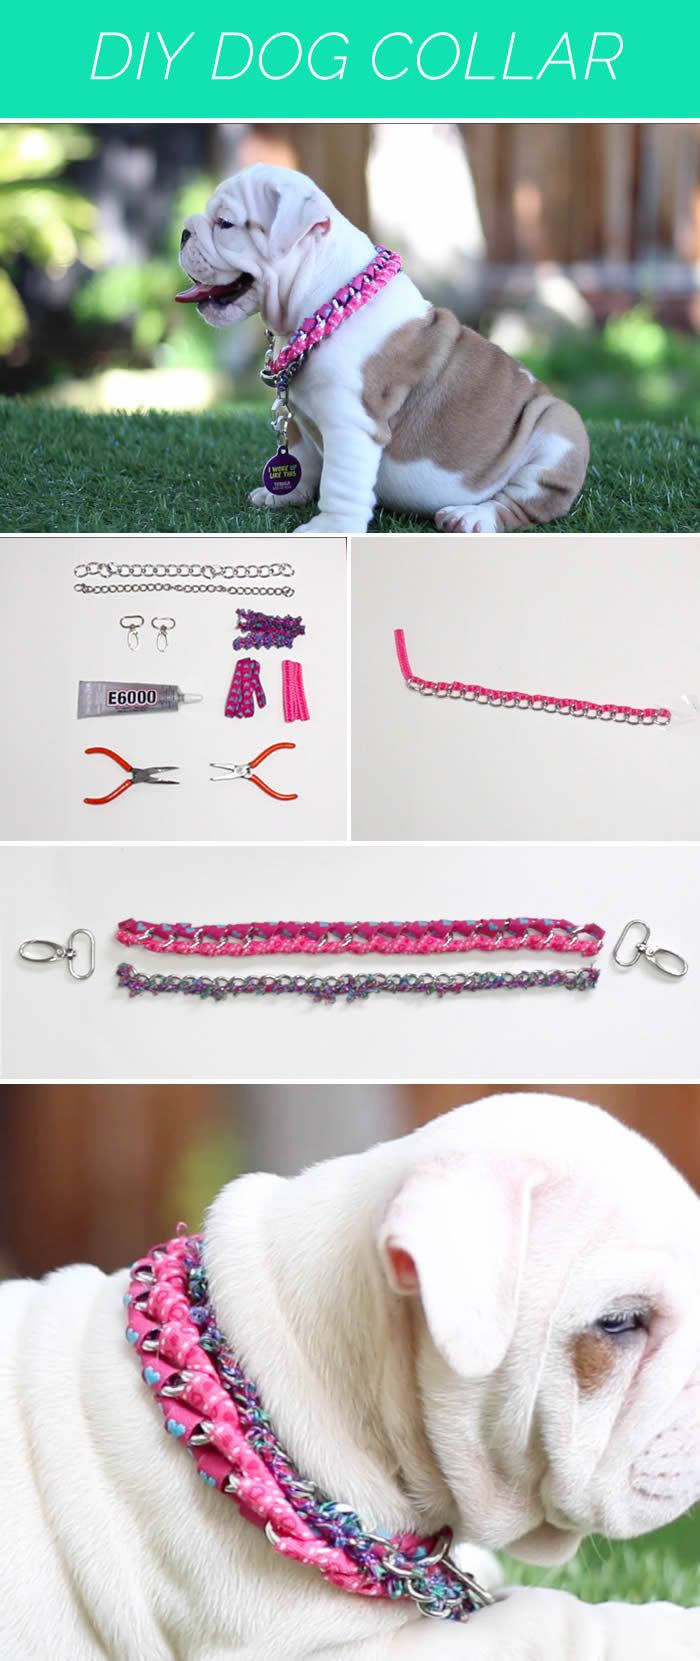 Decorative Dog Collar (diy) Awesome Dogshow To Make